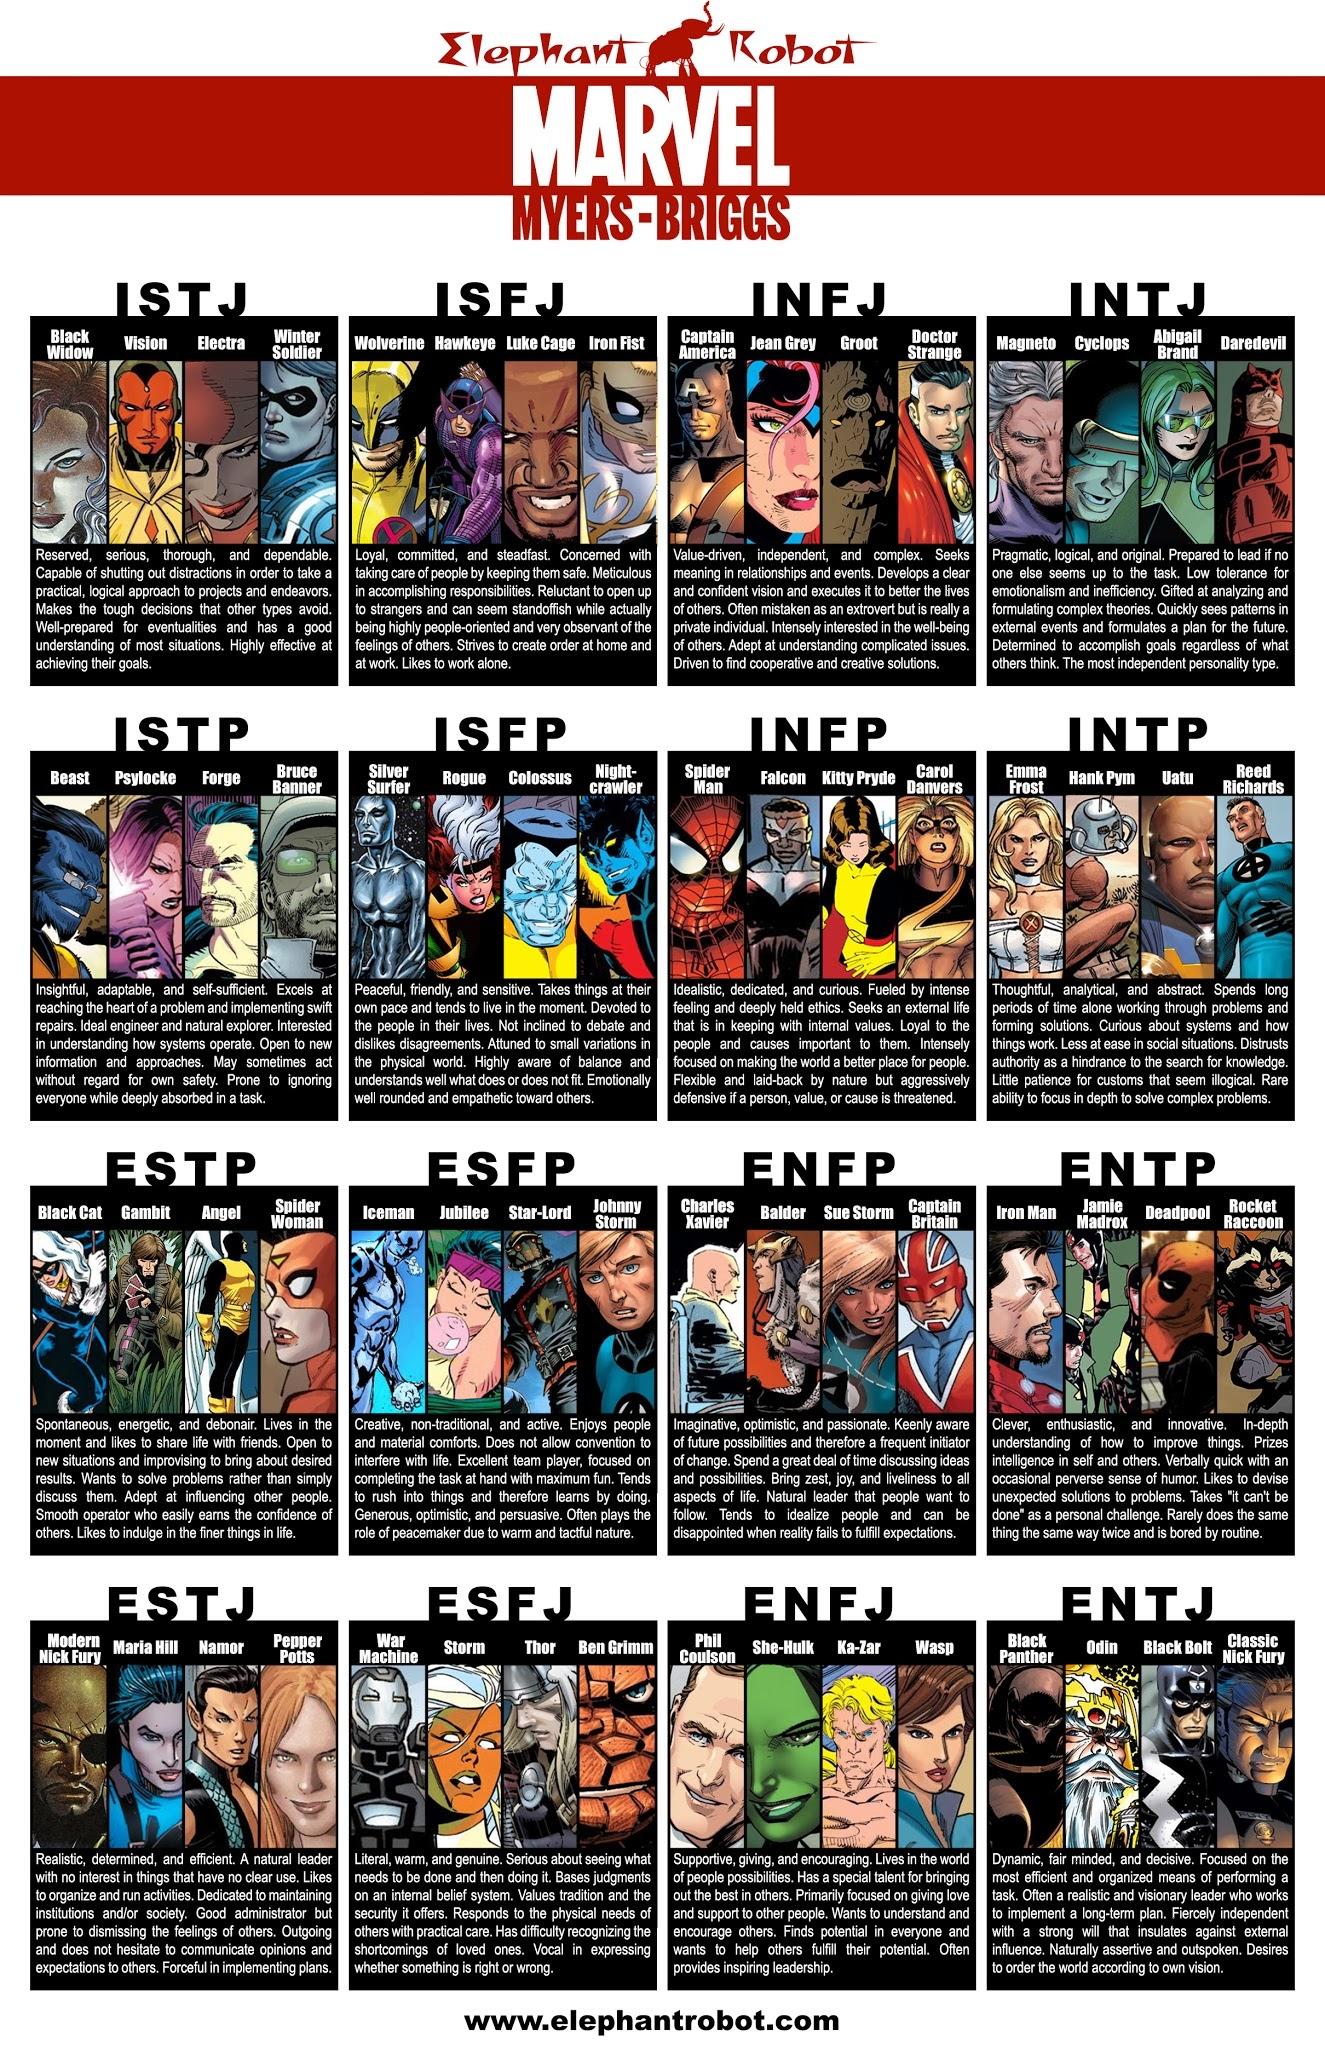 Marvel+MB.jpg